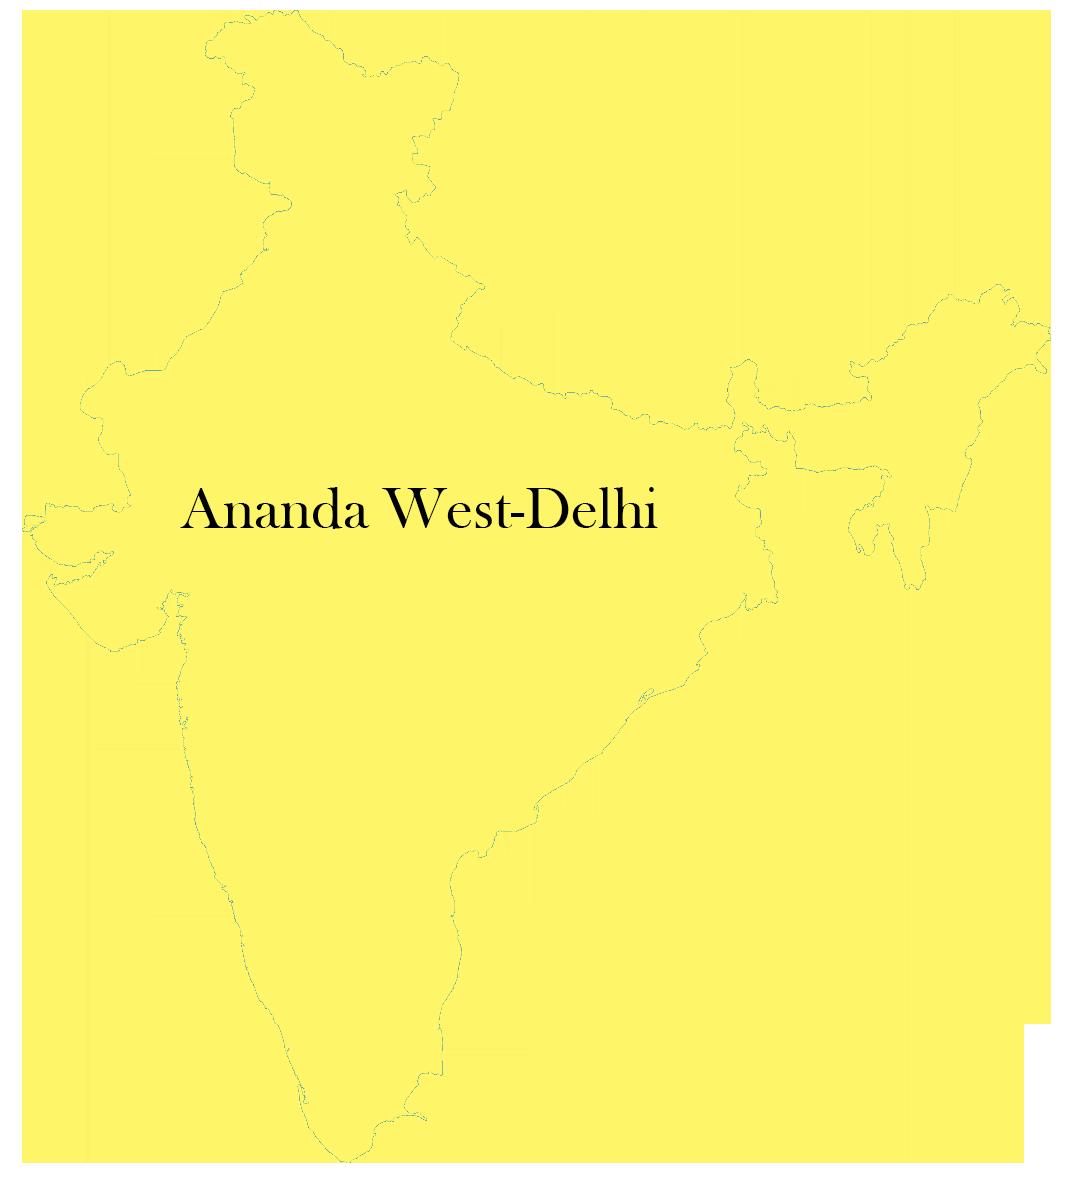 Ananda West-Delhi